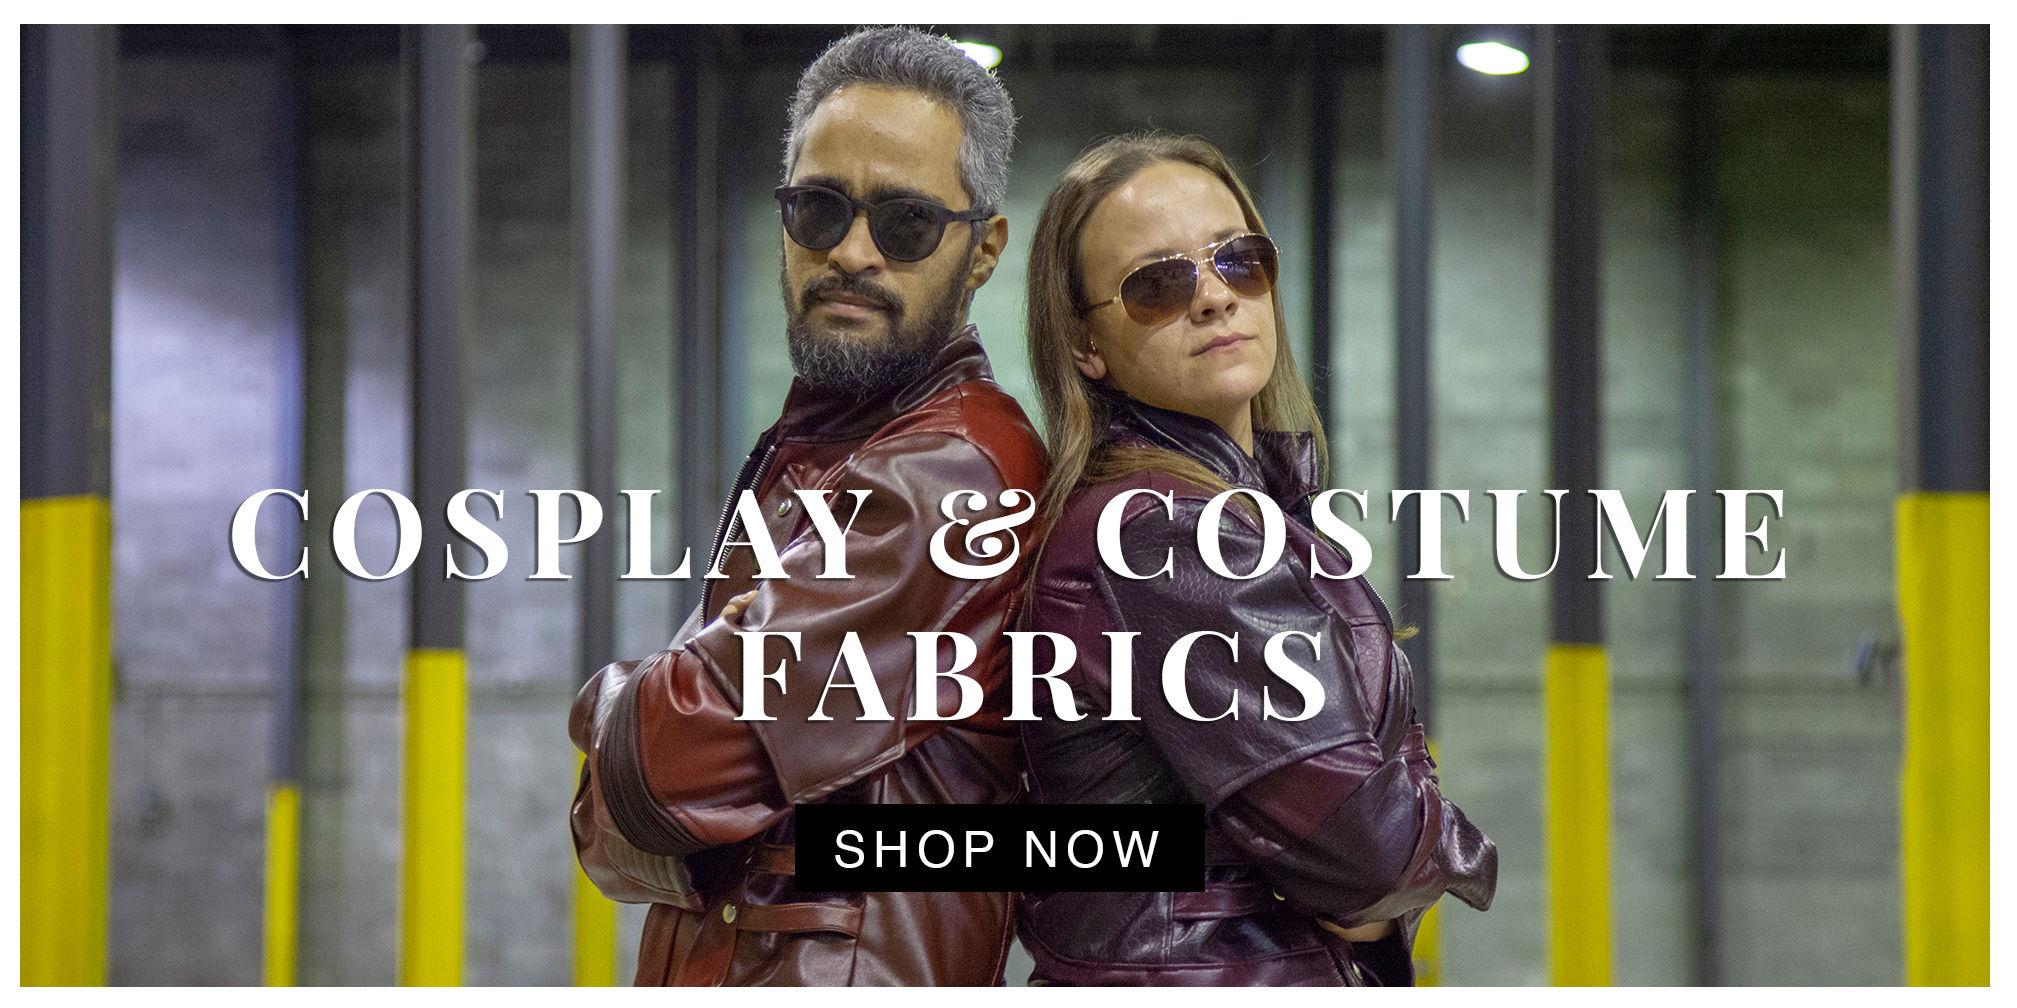 Costuming & Cosplay Fabrics